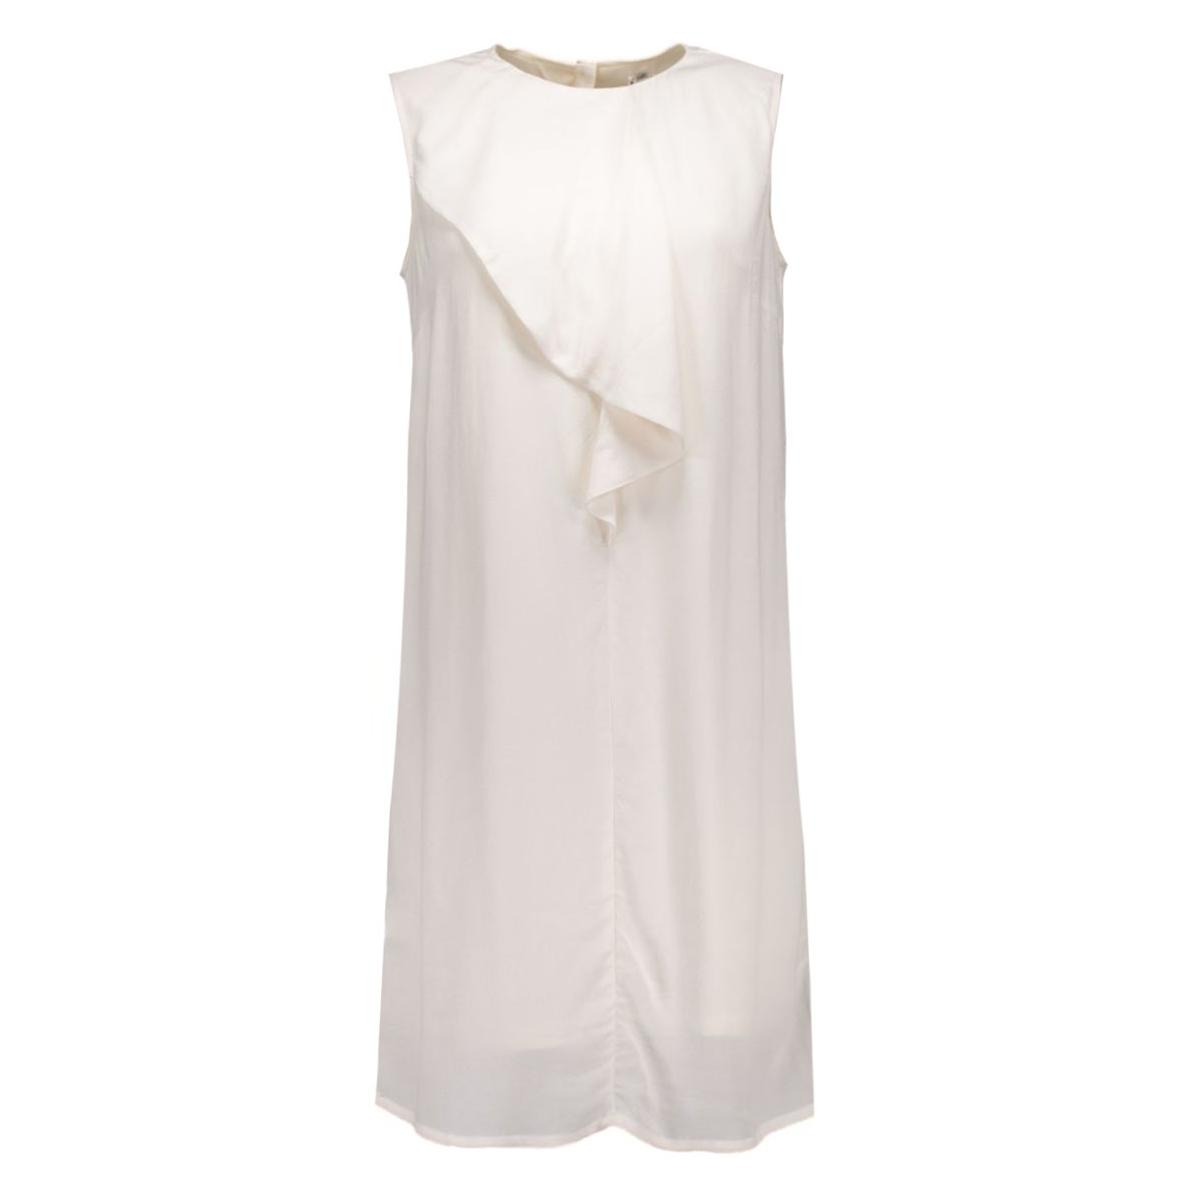 n6135 saint tropez jurk 1053